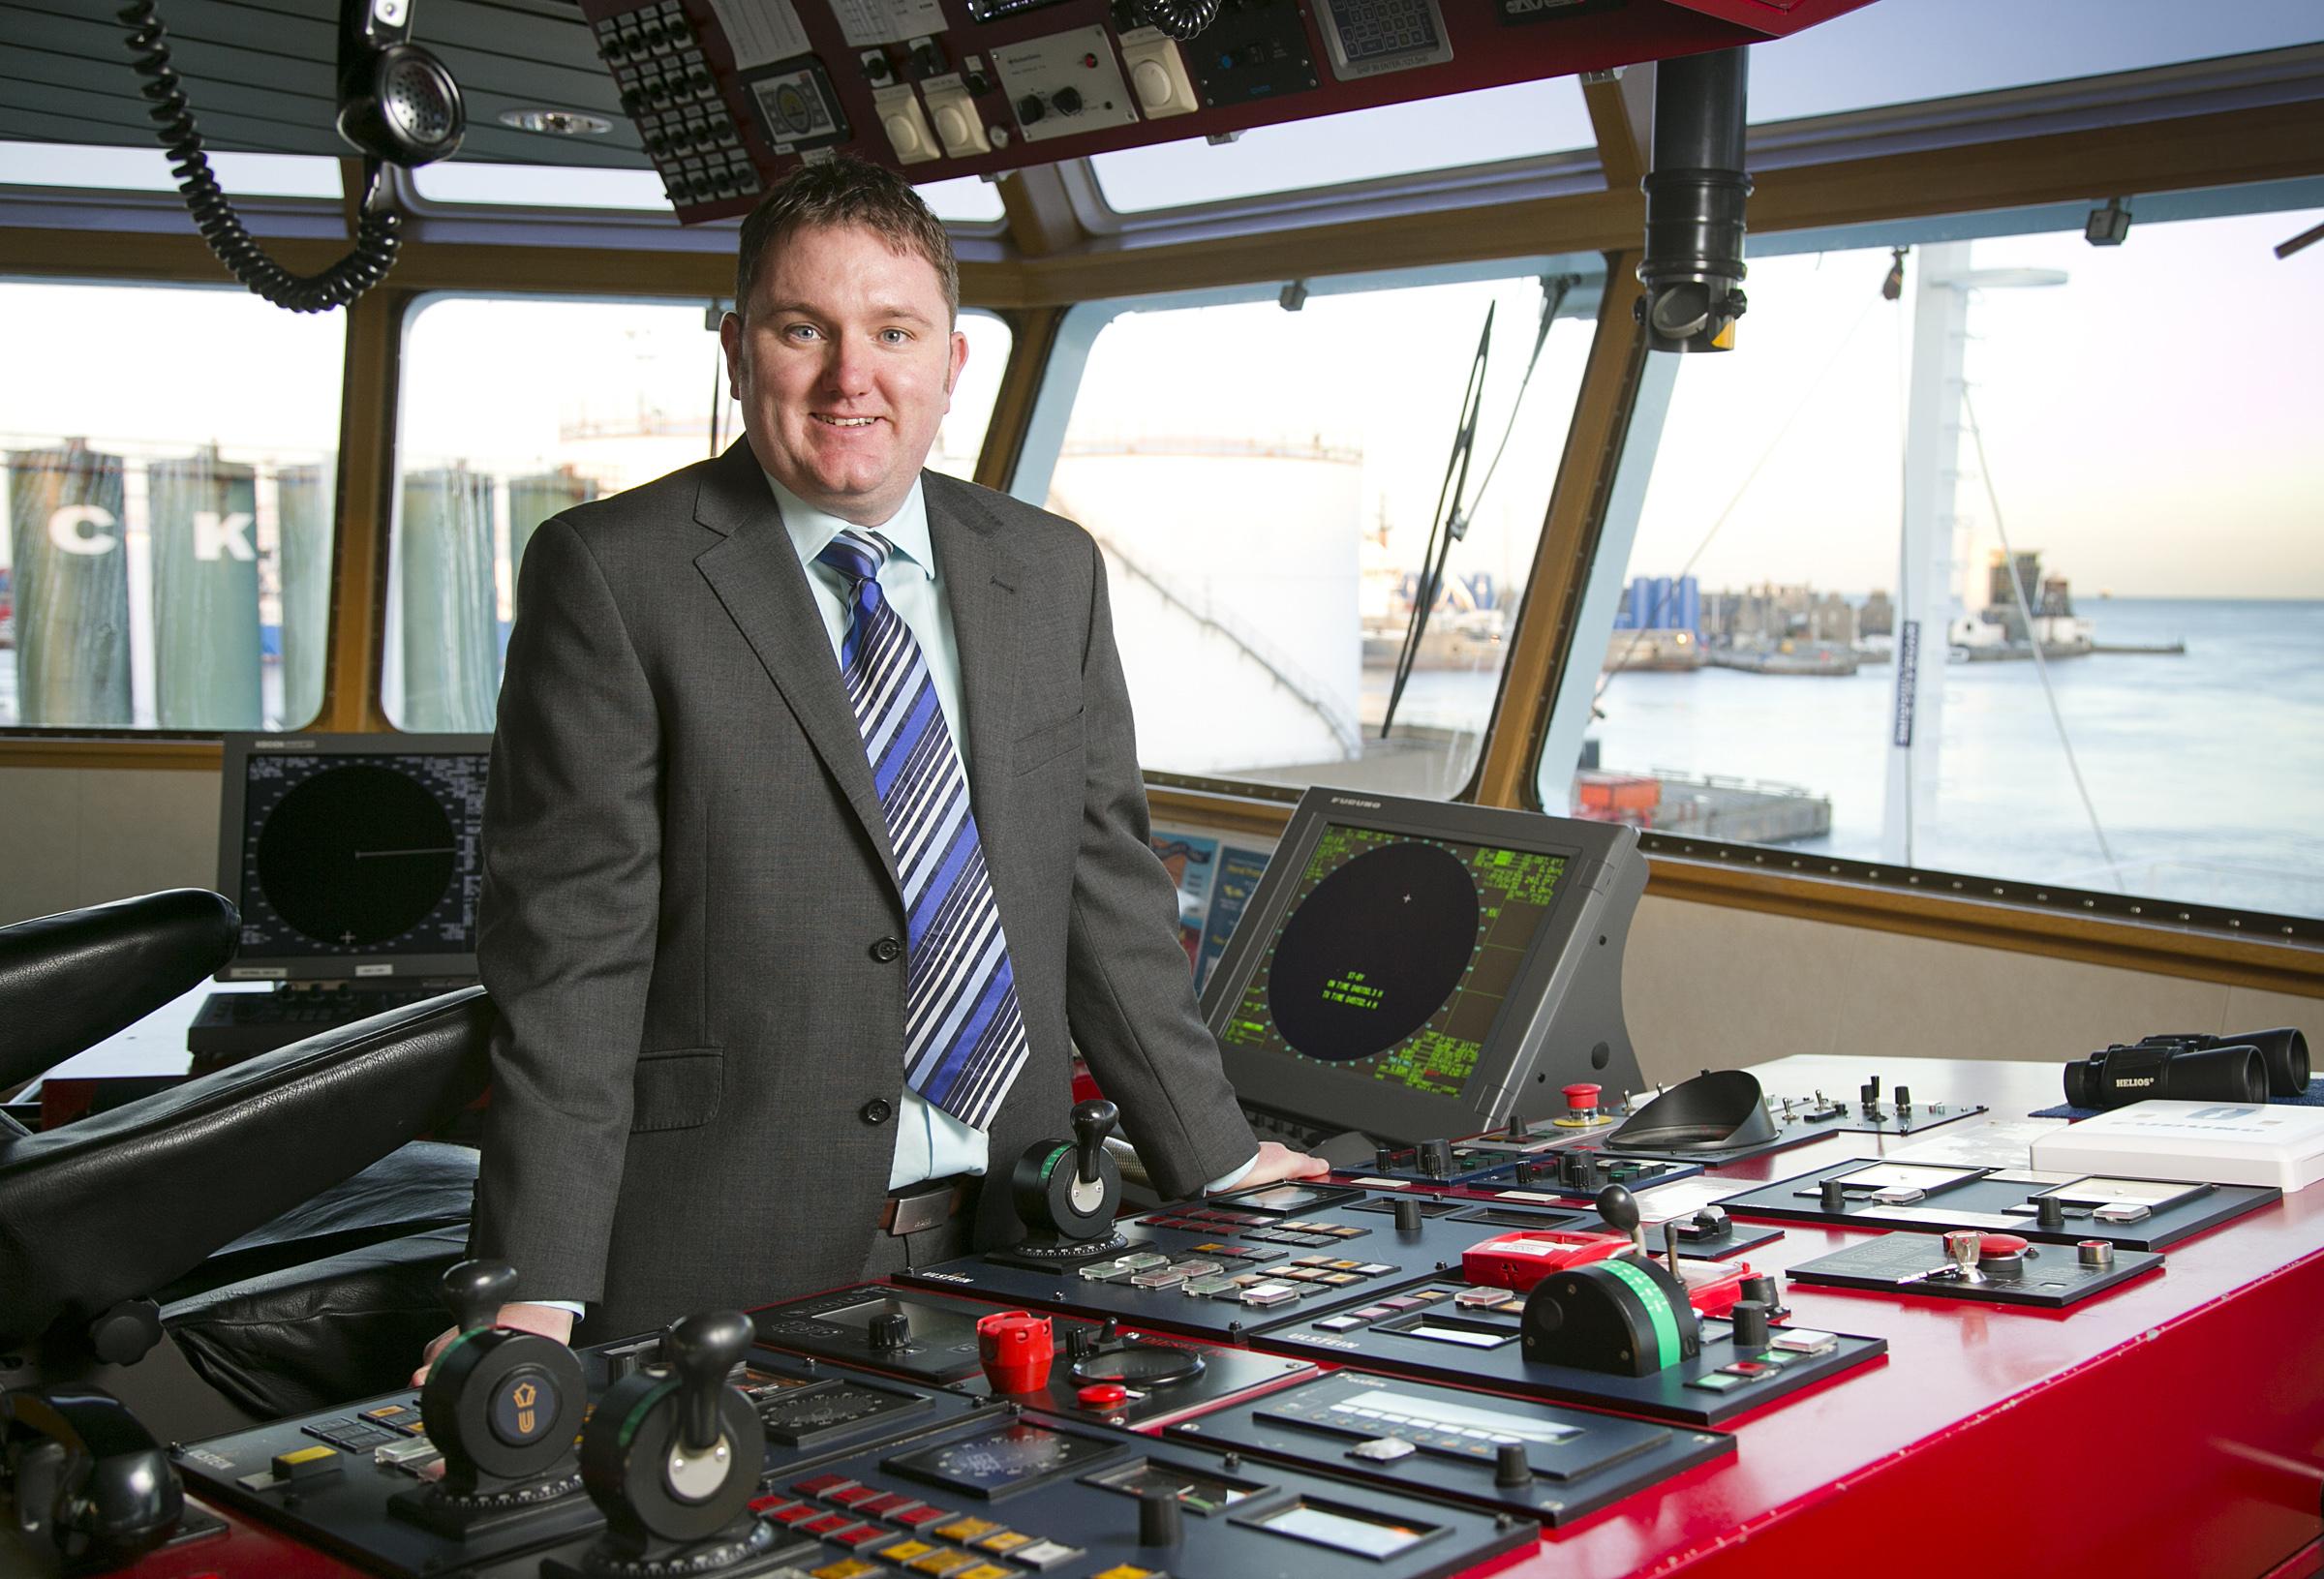 Matthew Gordon has joined Atlantic Offshore Rescue